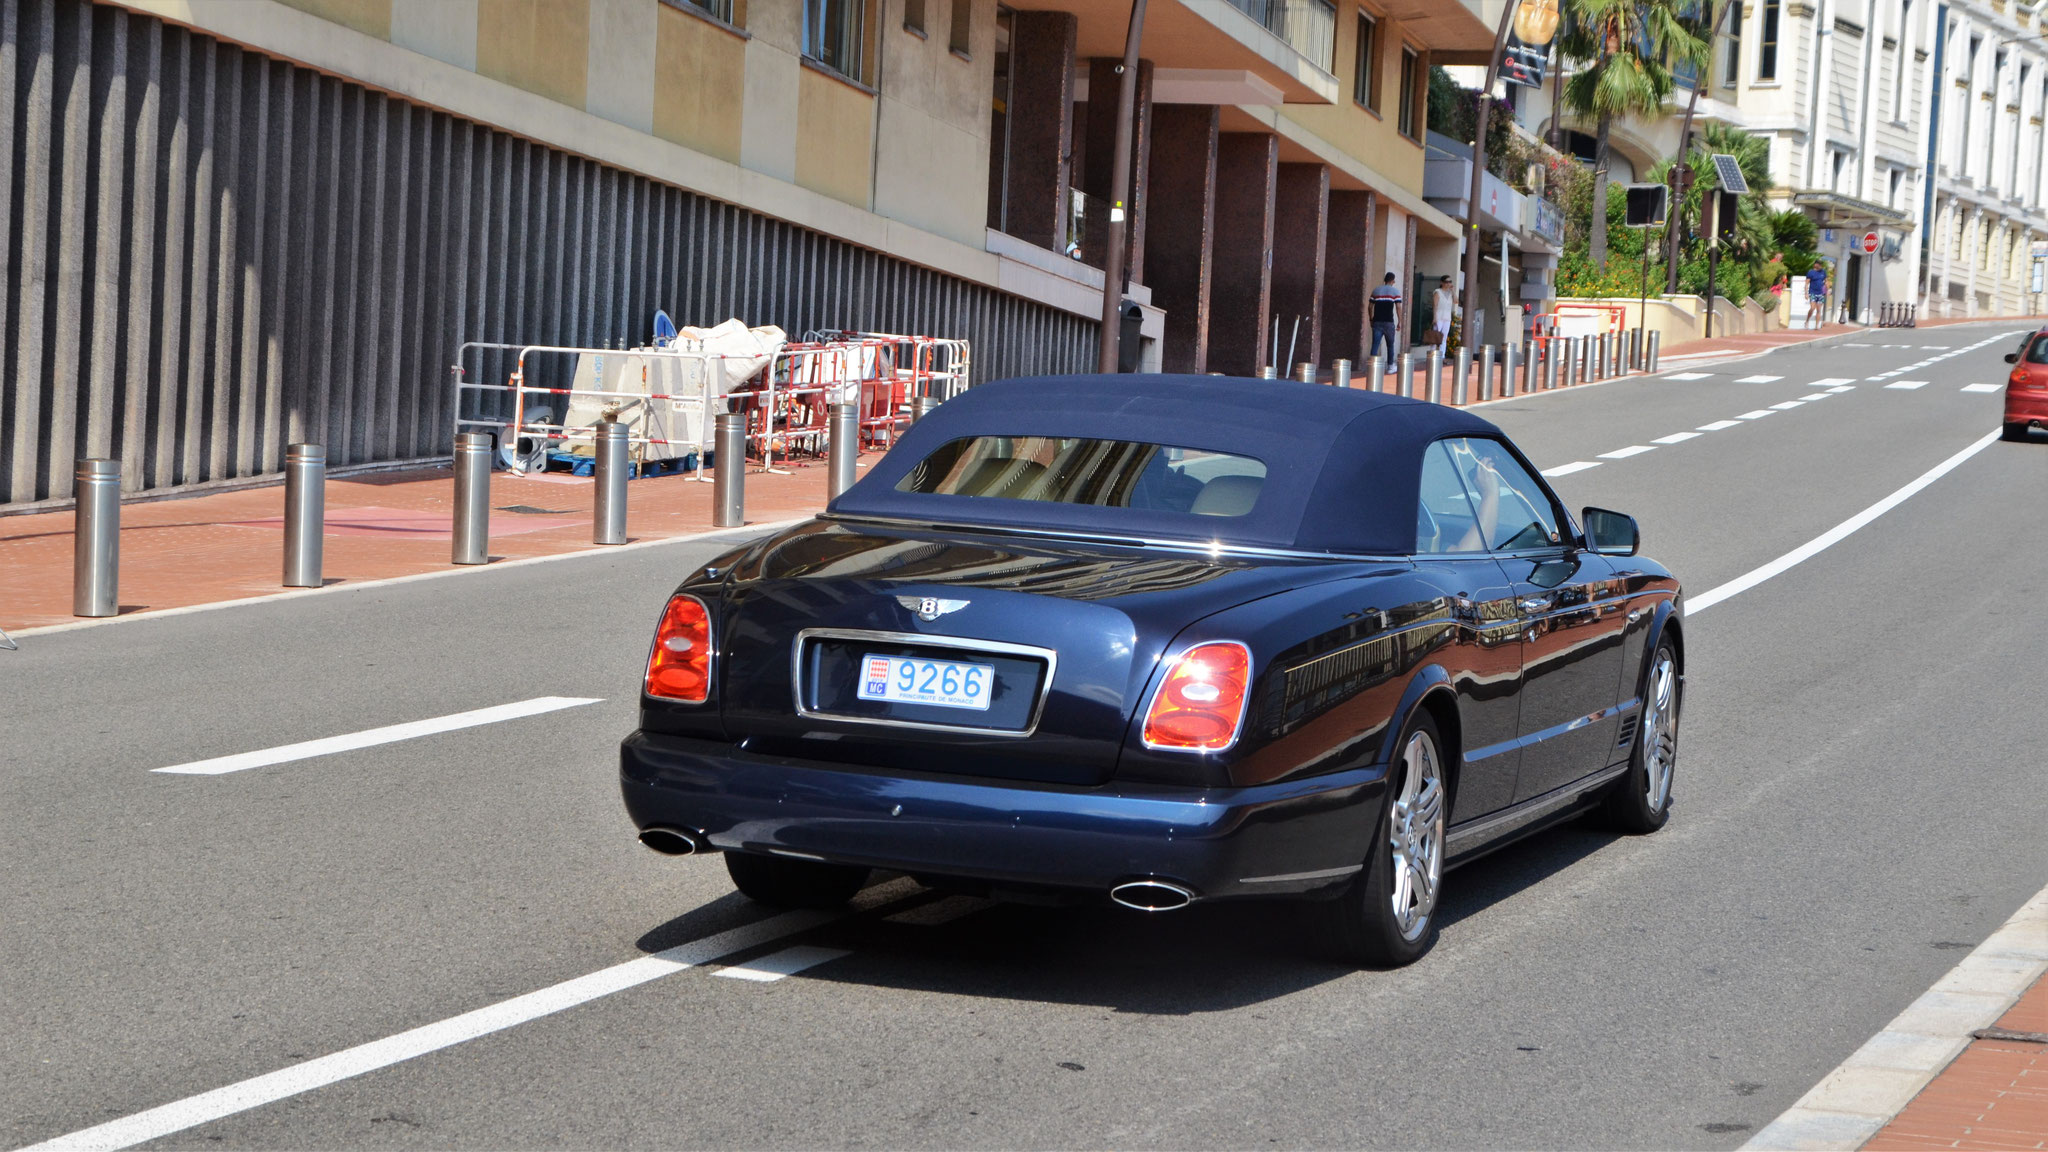 Bentley Azure - 9266 (MC)